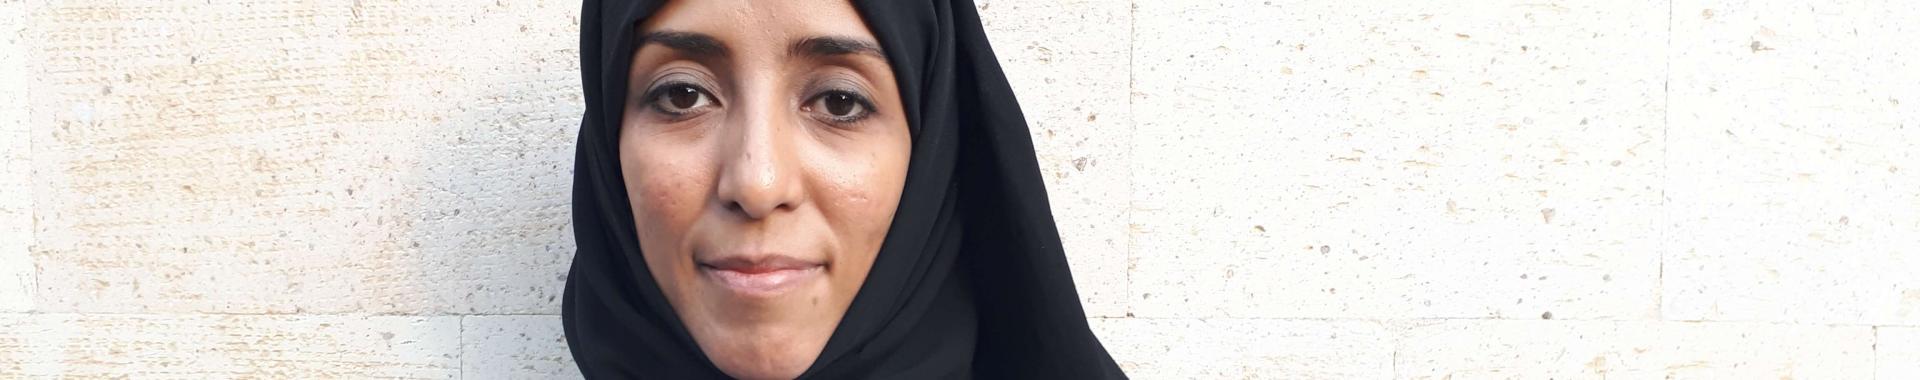 "Iêmen: ""Viver se tornou mais difícil"""